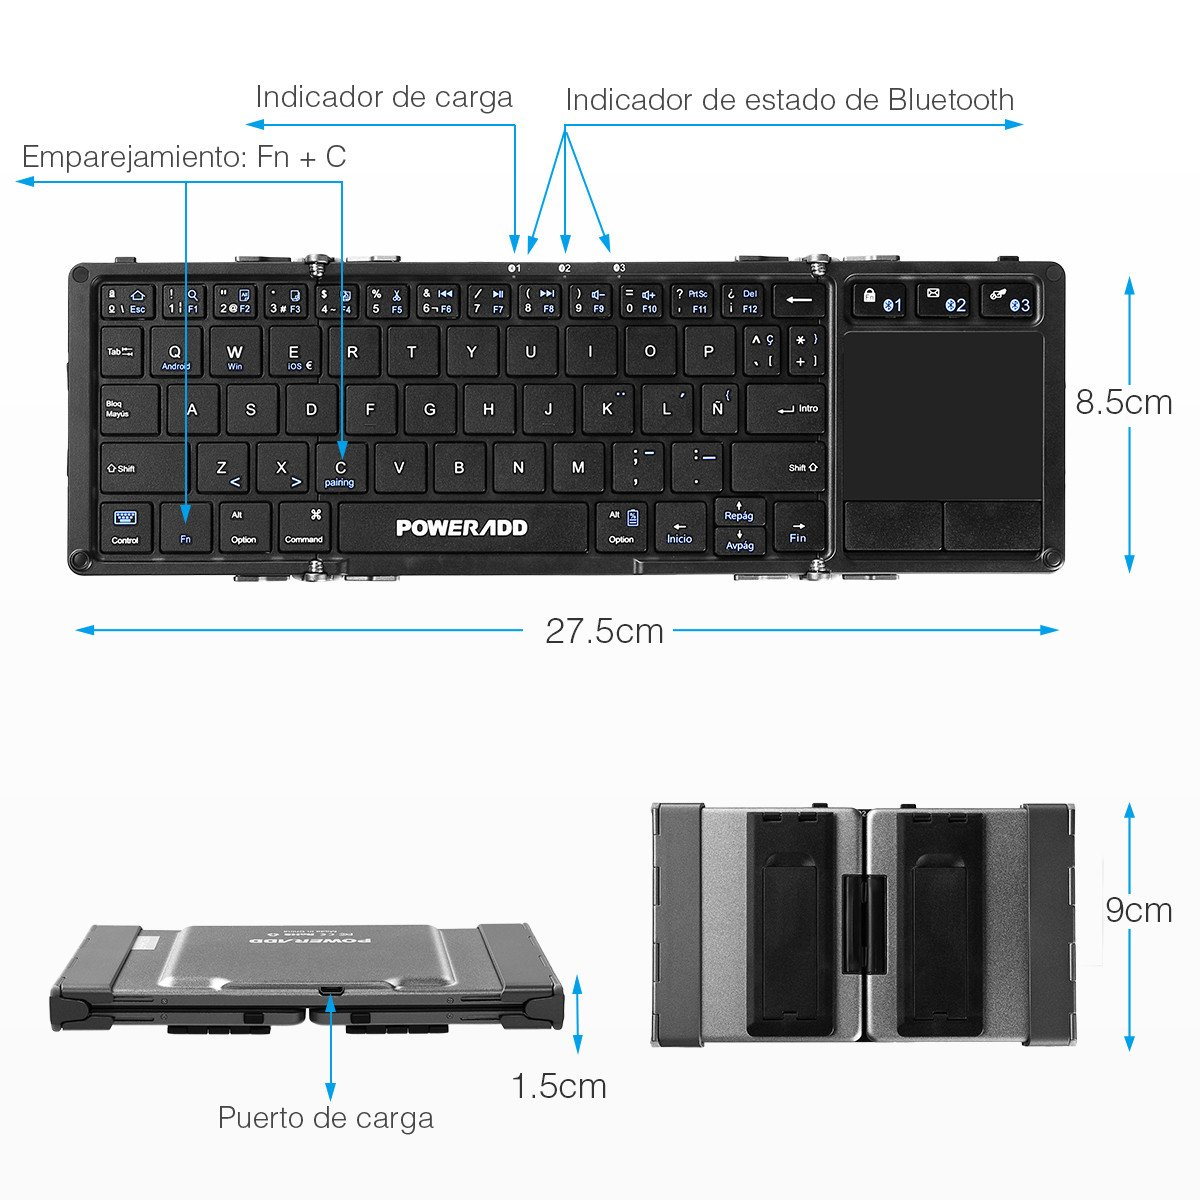 Poweradd Teclado Inalámbrico con Multi-touchpad de Español con Tri-plegable,Compatible con Android, Windows, iOS ,Smartphone